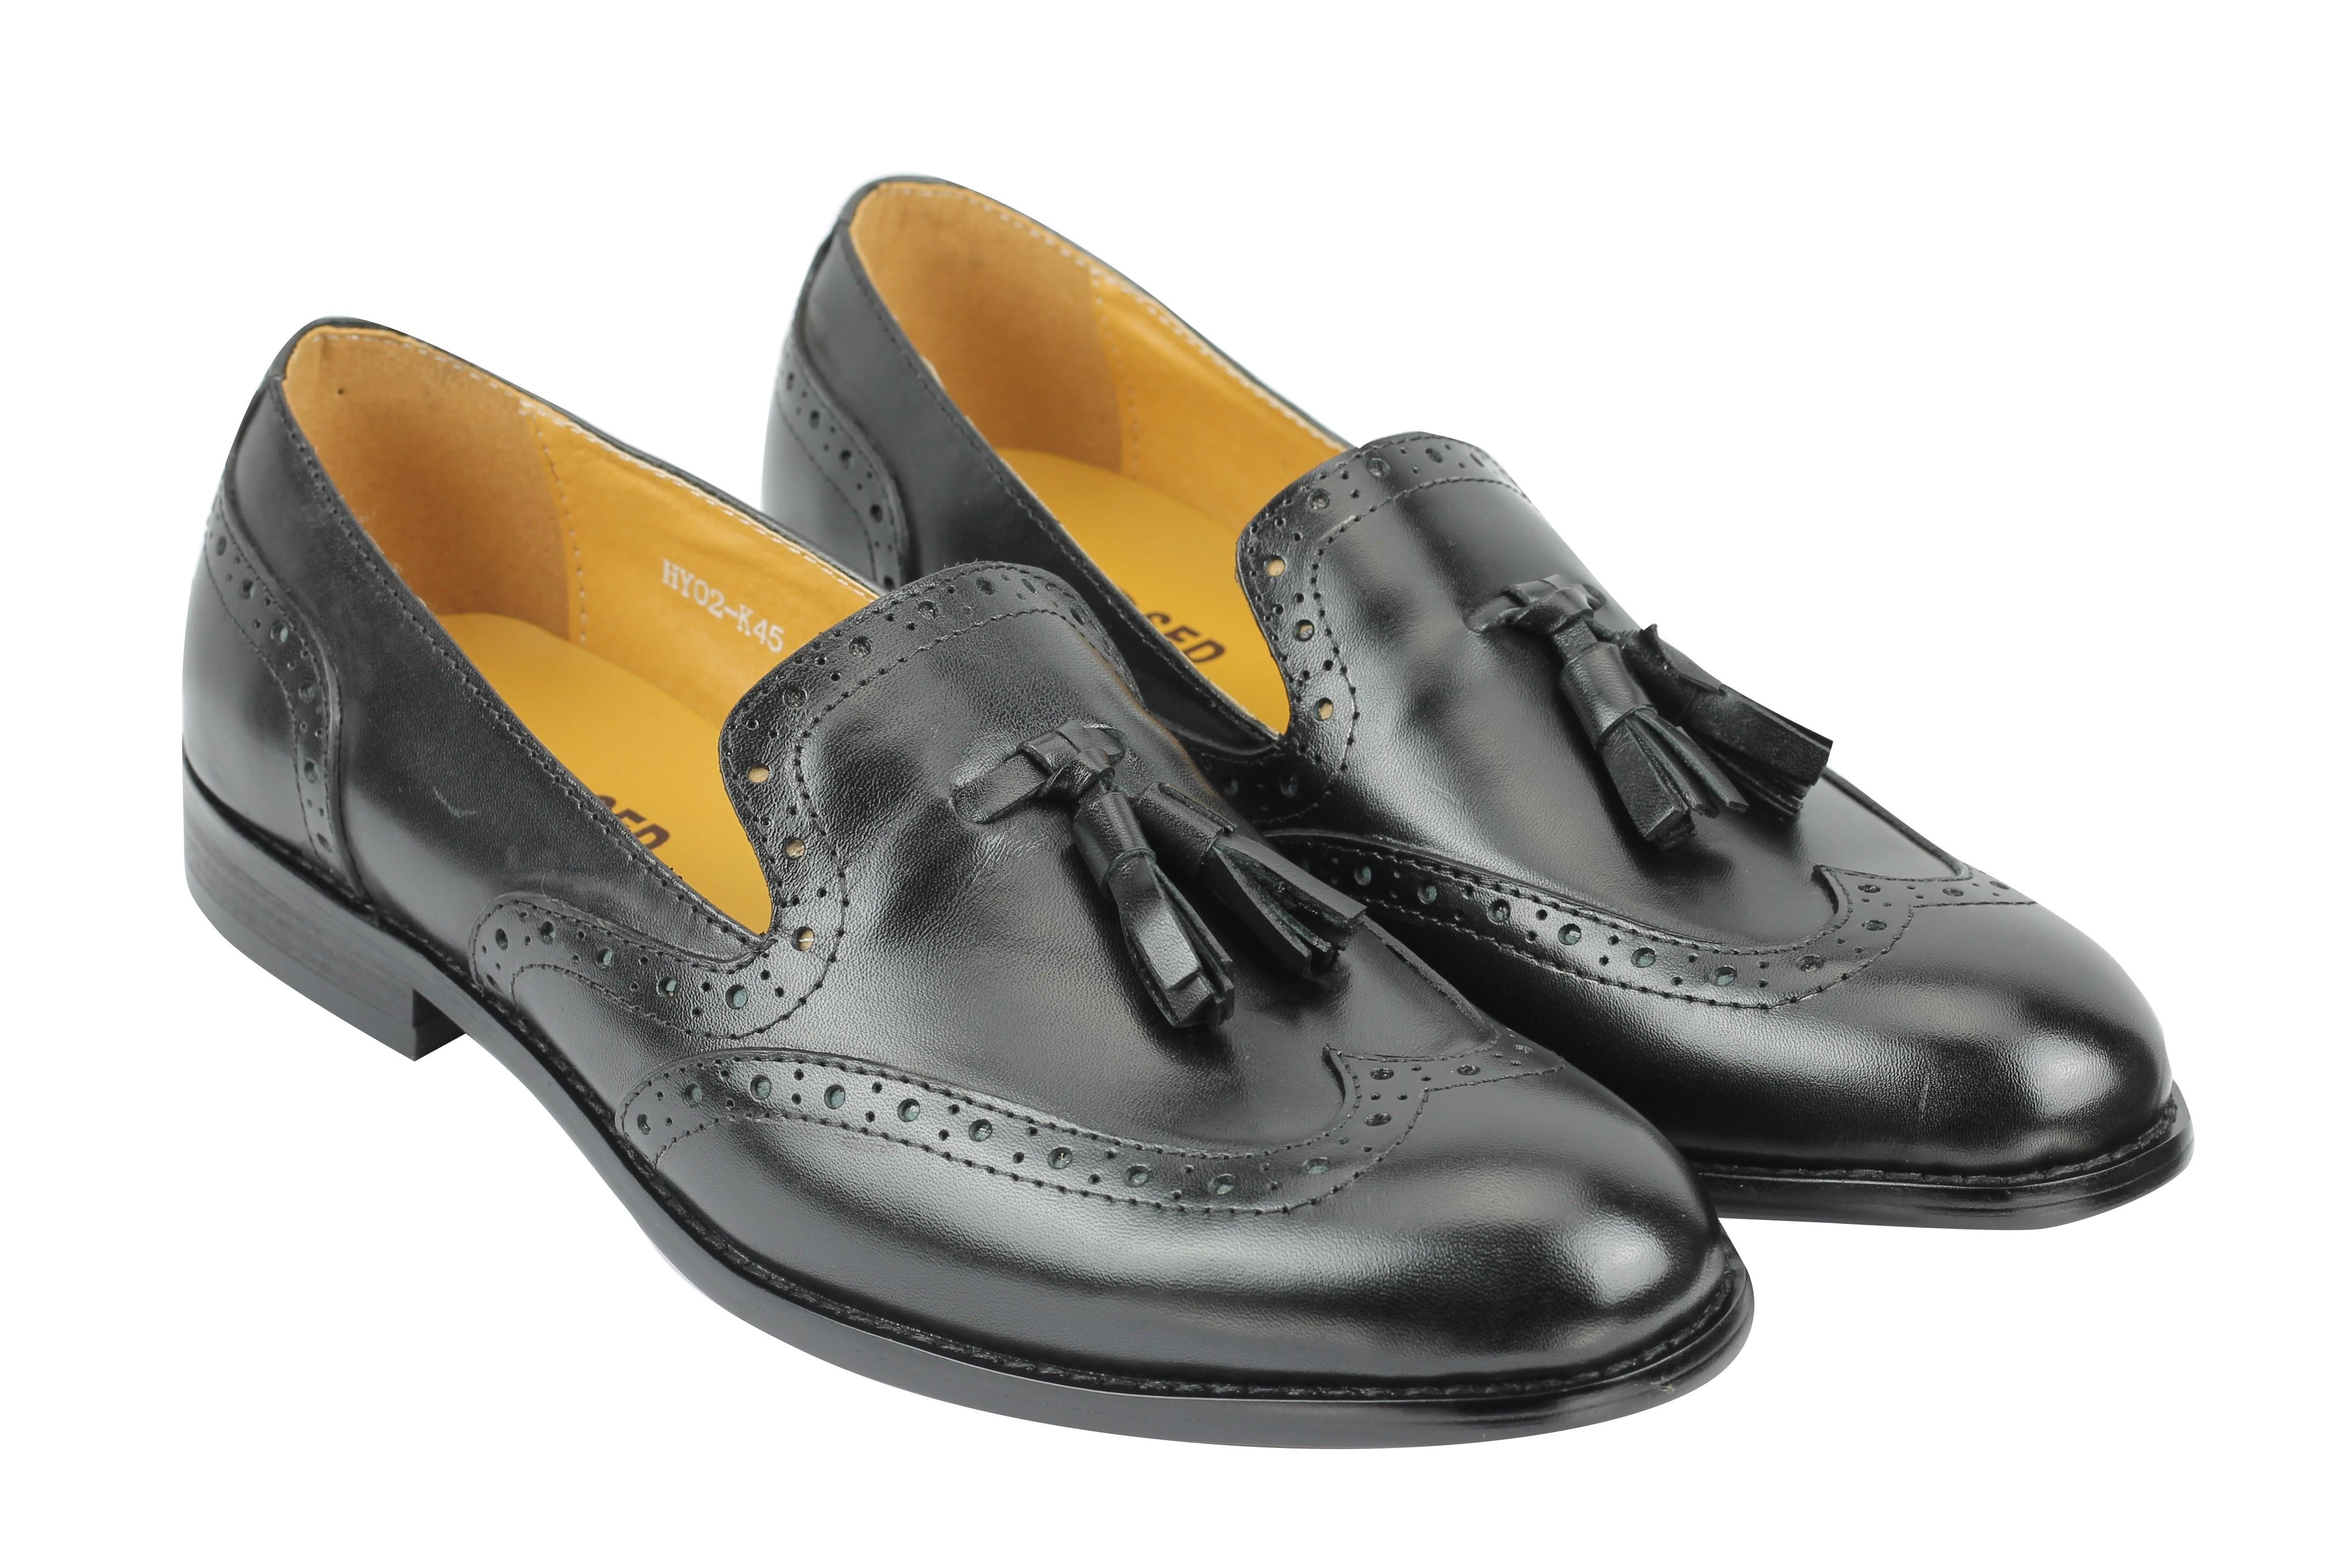 0158360c376da Details about Mens 1920s Vintage Real Leather Tassel Loafers Slip on Brogue  Shoes Brown Black